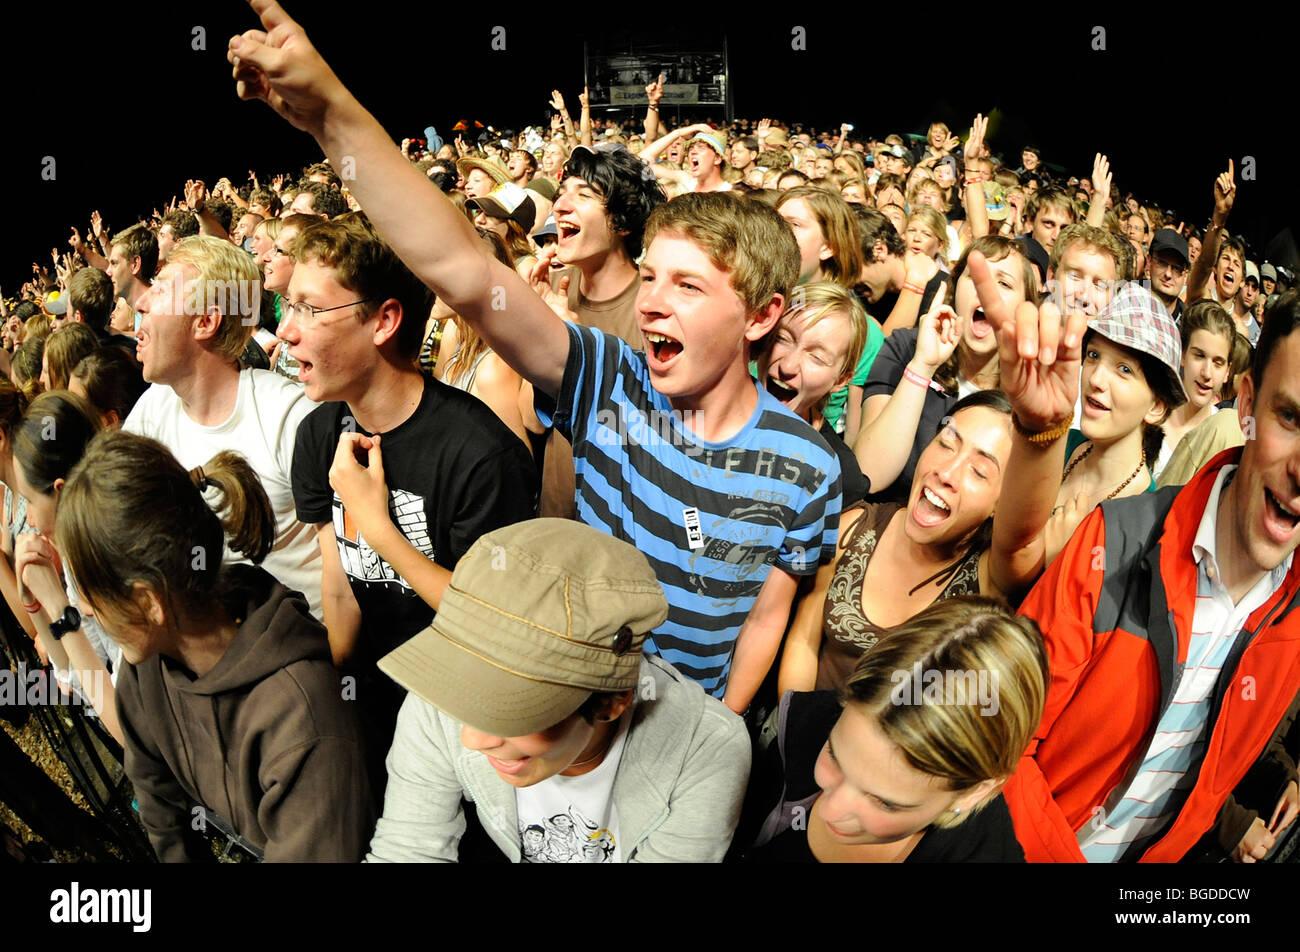 Masse auf ein open Air Konzert, Sonnenrot Festival Geretsried, Bayern, Deutschland, Europa Stockbild